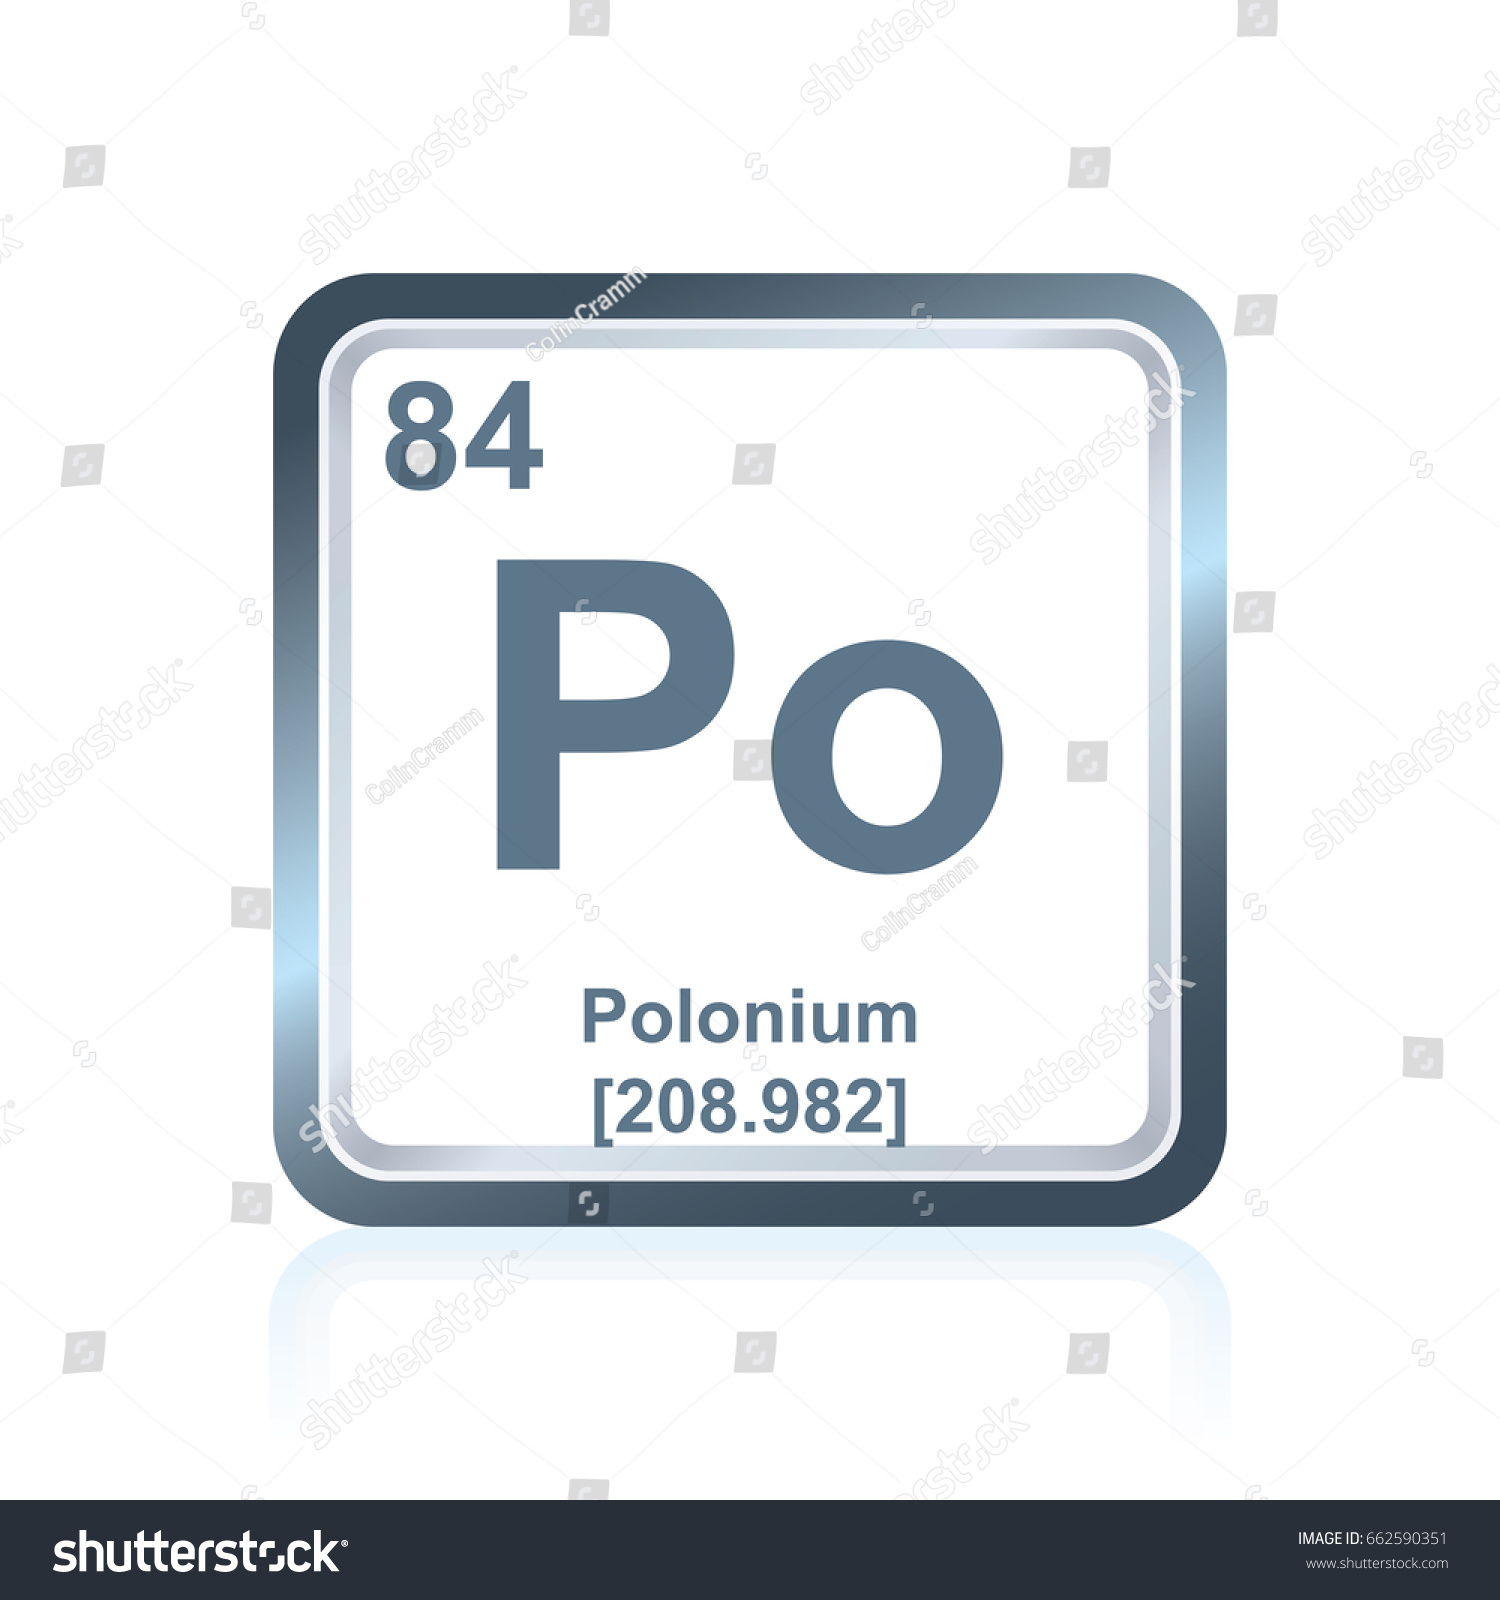 Periodic table polonium choice image periodic table images periodic table polonium choice image periodic table images chemical elements periodic table web calender blank periodic gamestrikefo Images